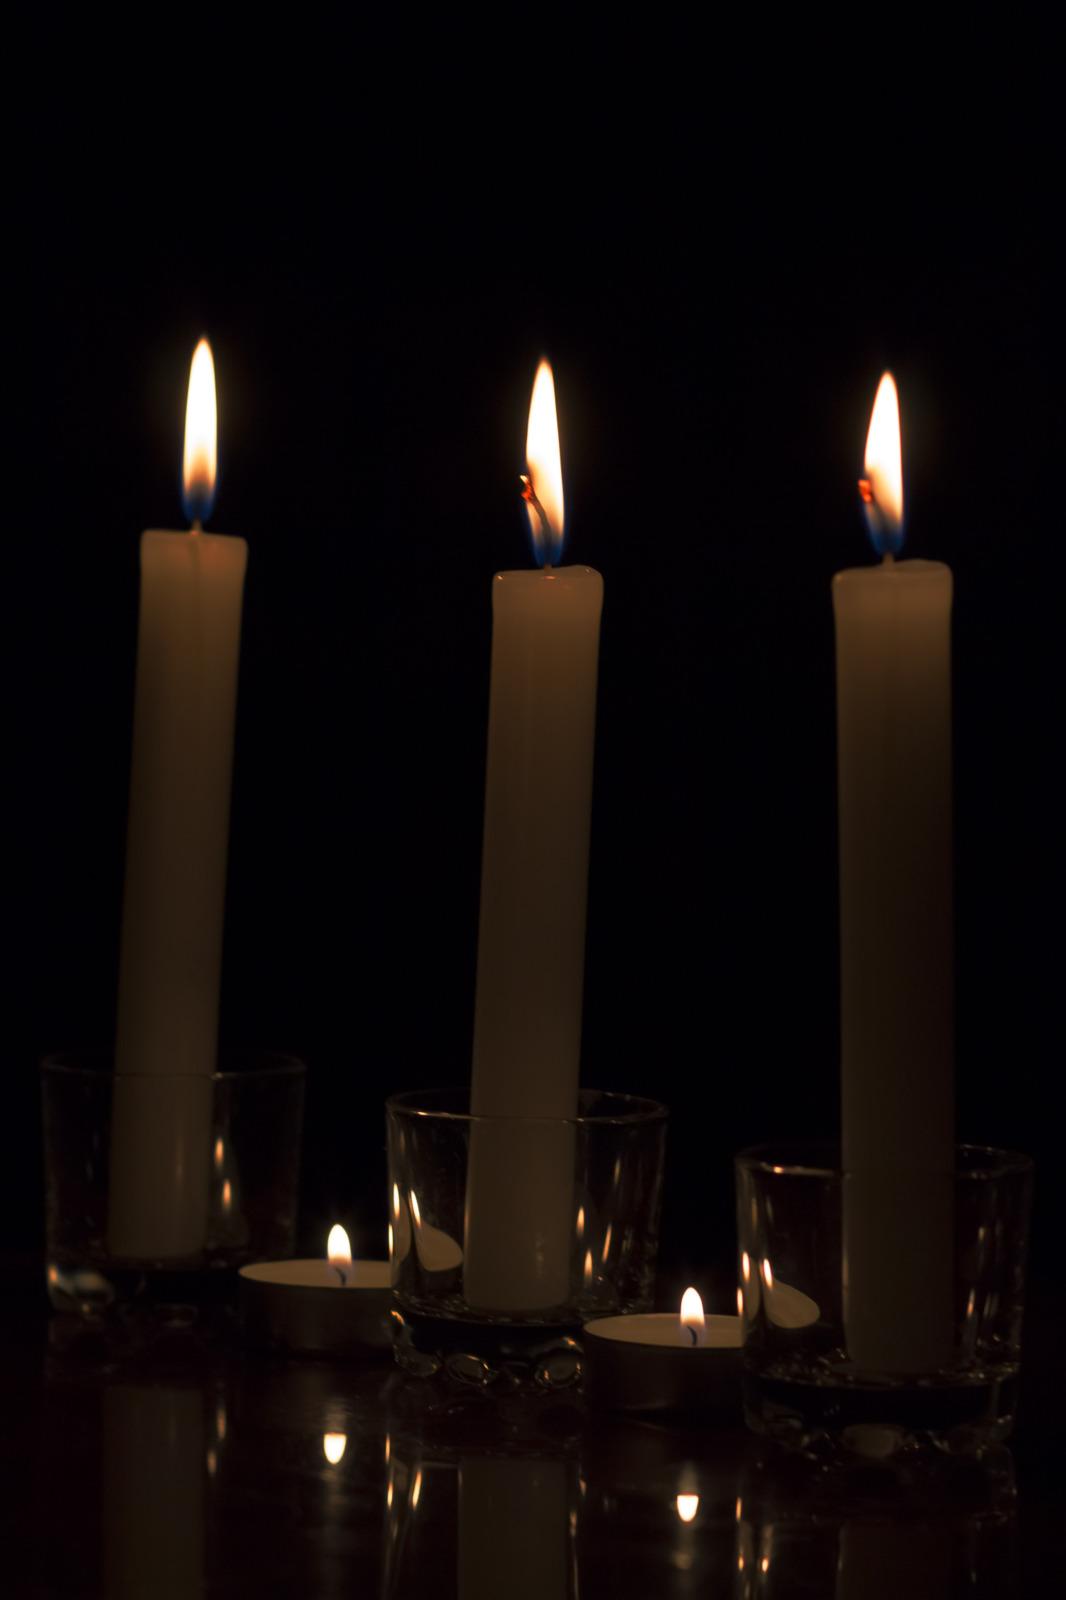 ПАСХА2017 16 апреля Традиции ПАСХИ Празднование ПАСХИ